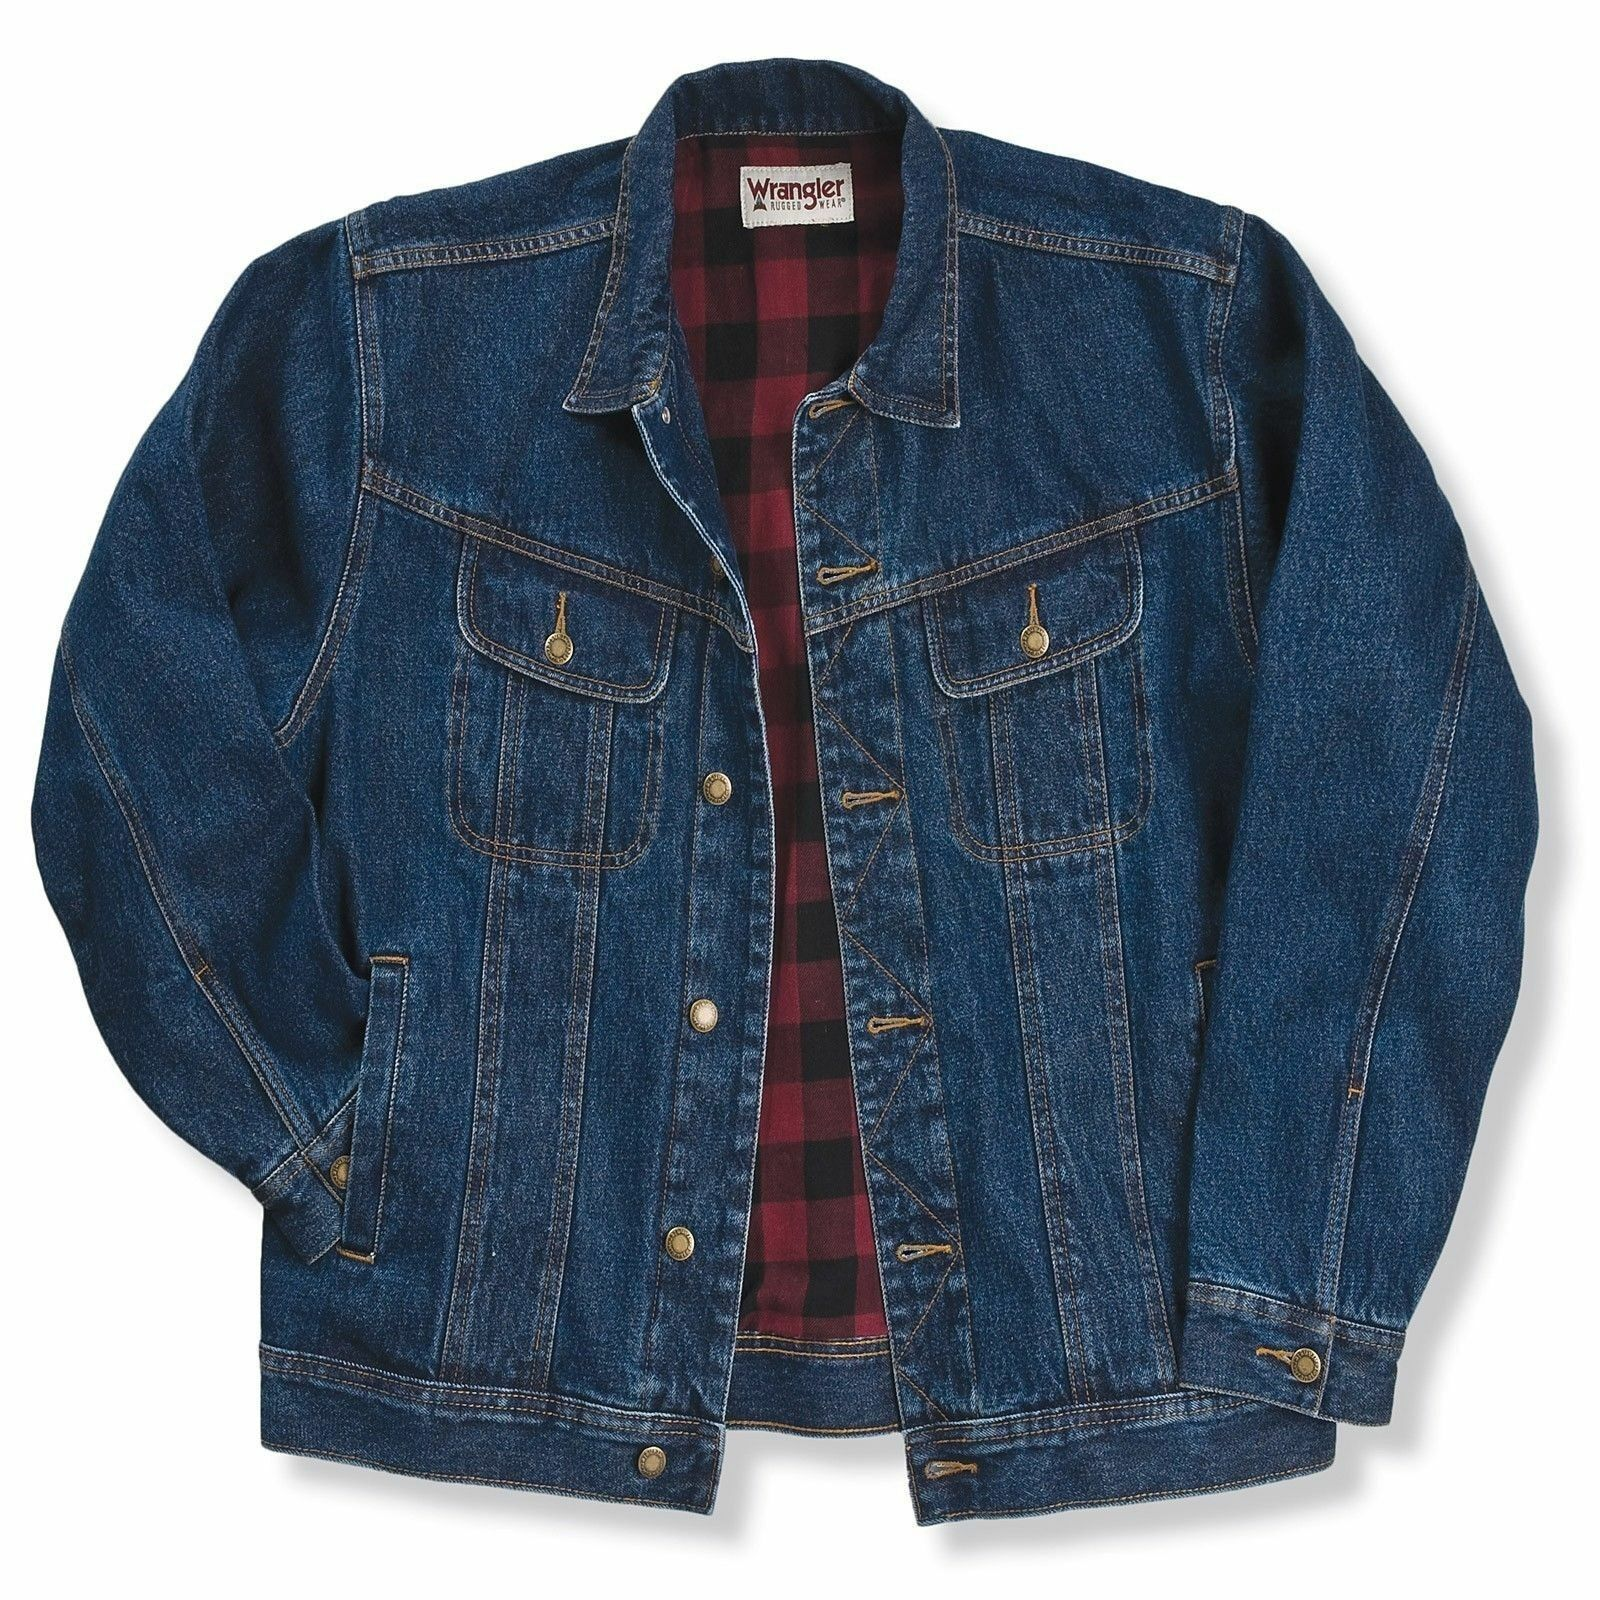 Mens Wrangler Rugged Wear Flannel Lined Denim Jacket Coat All Sizes RJK32AN